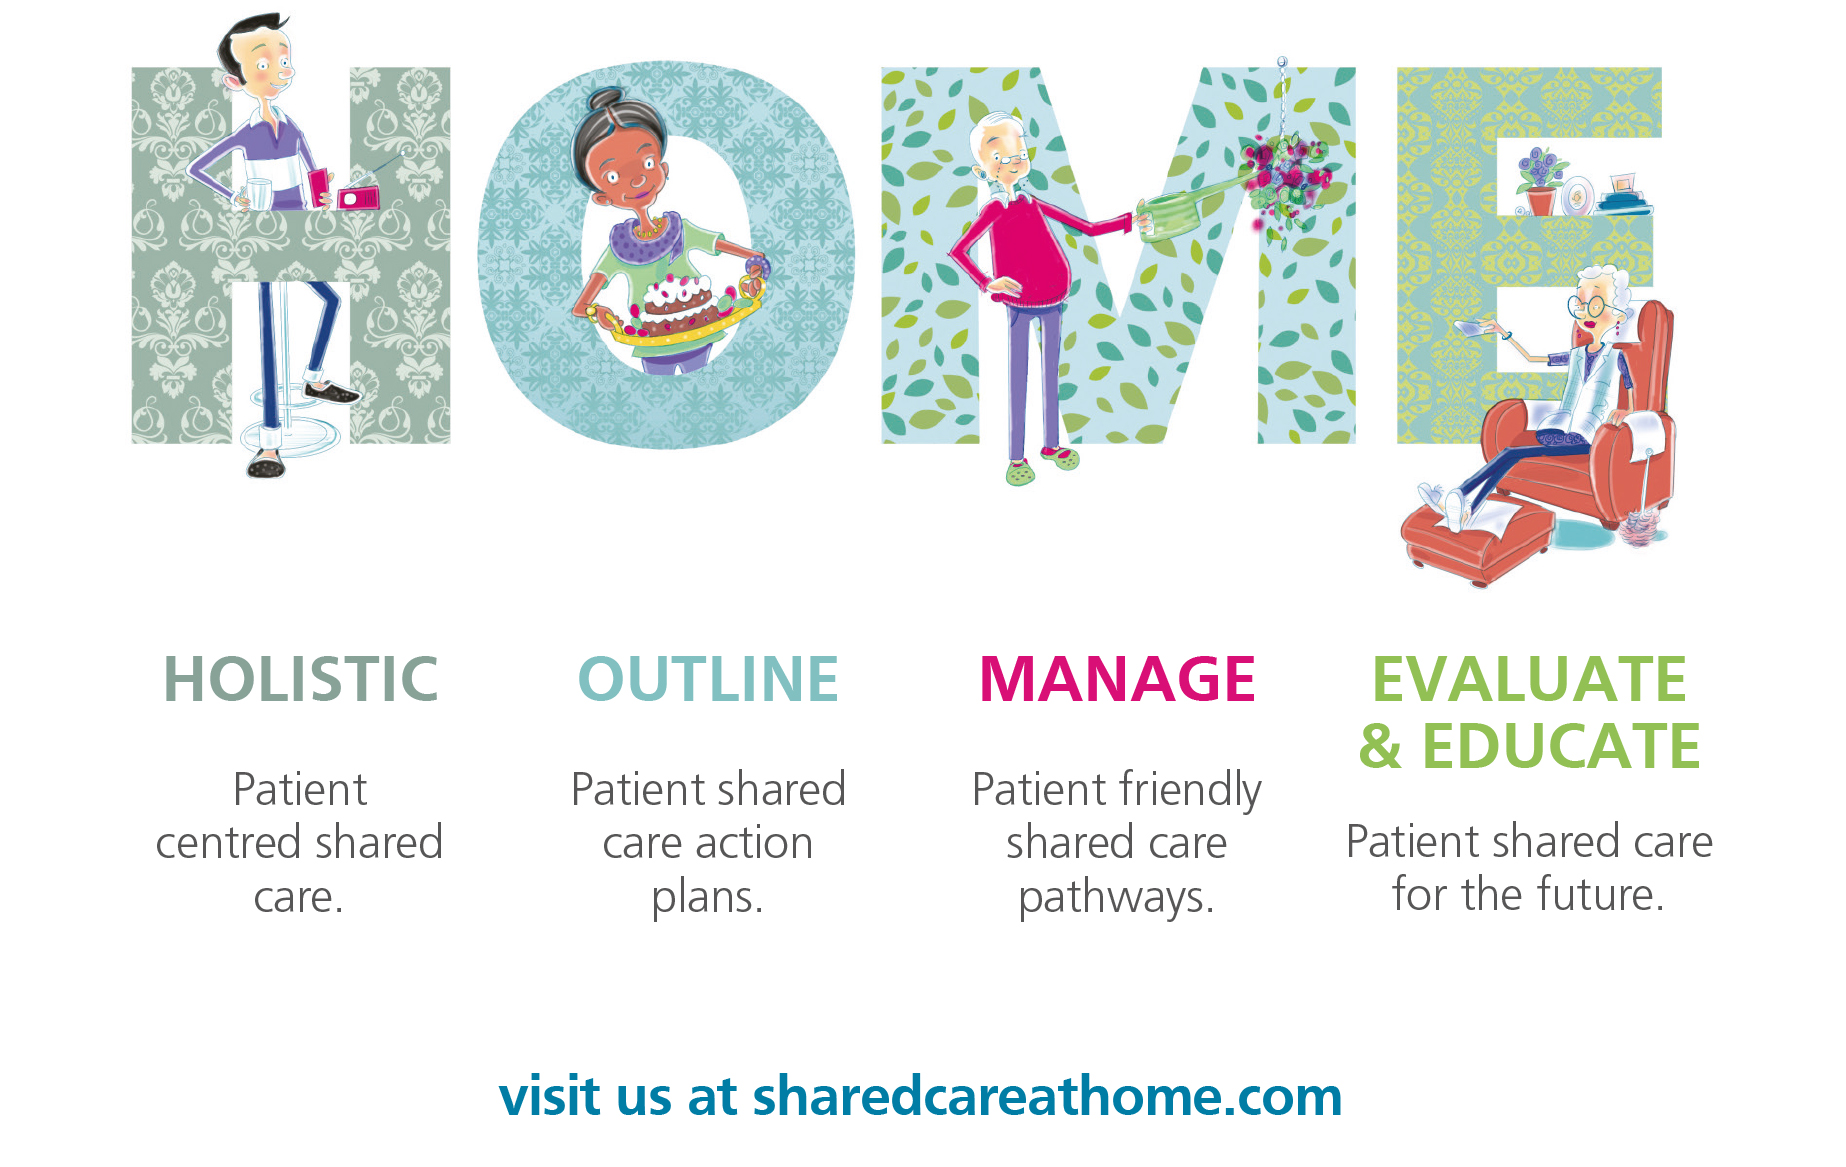 HARTMANN UKI Launches 'HOME' Shared Care Initiative